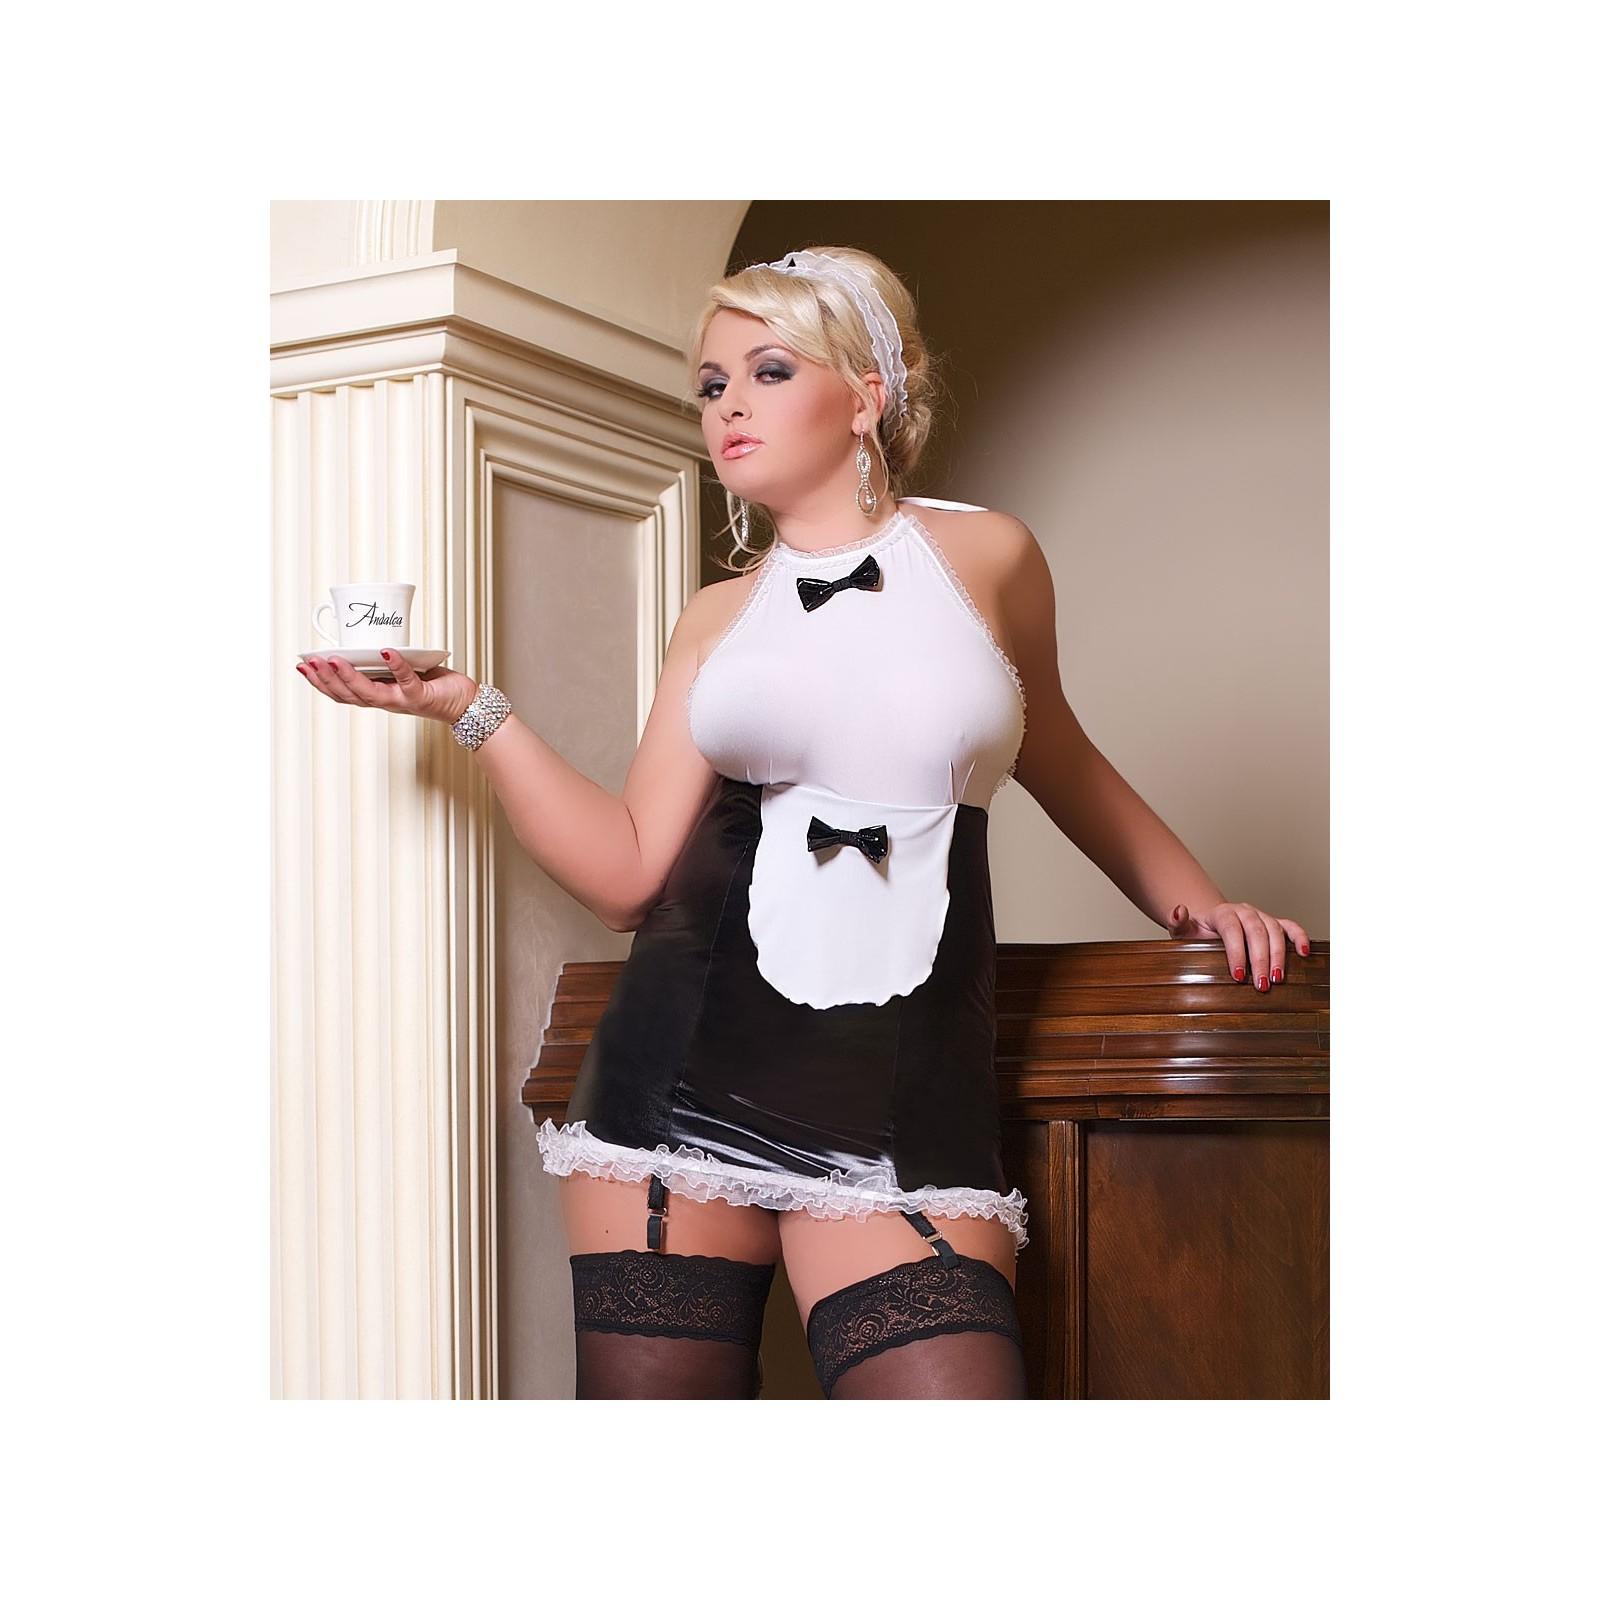 Luxe Waitress Outfit S/3035 - 1 - Vorschaubild